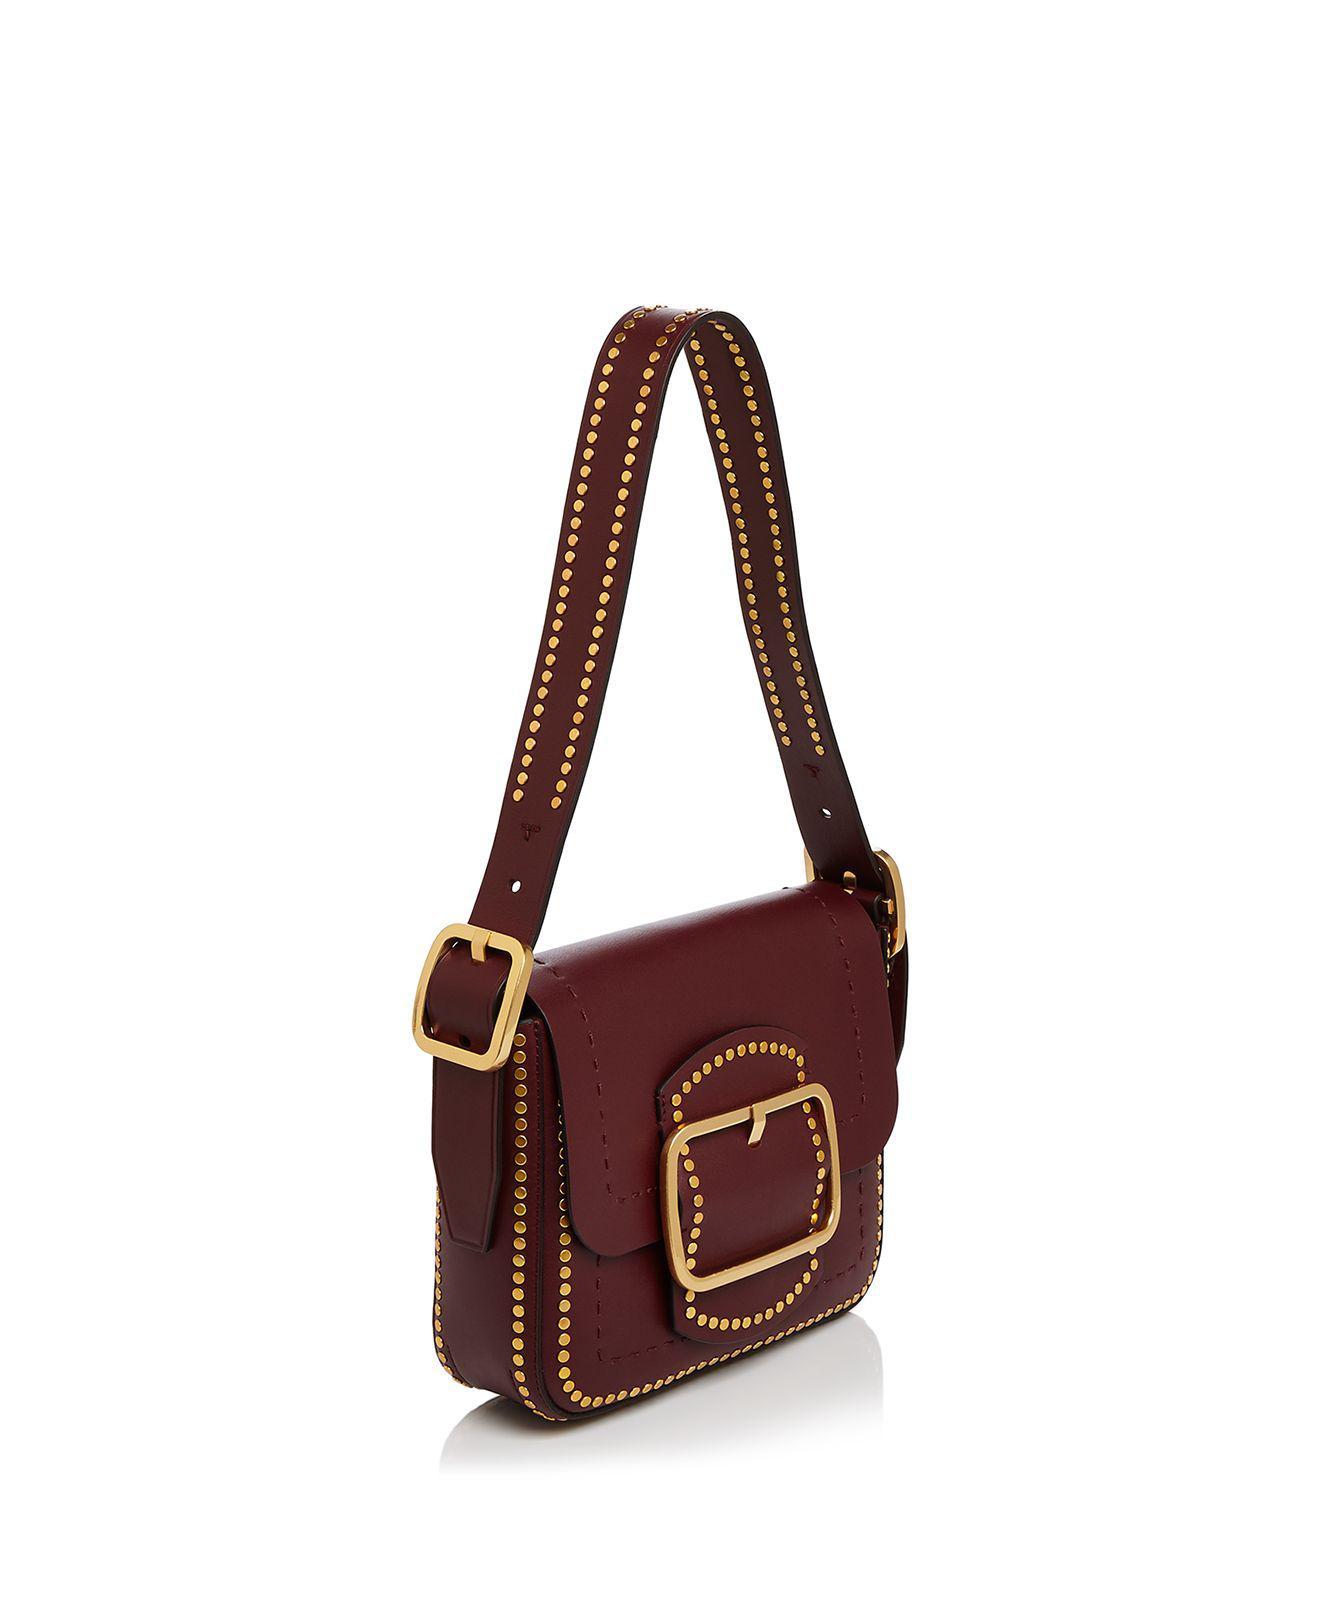 Tory Burch Sawyer Stud Small Leather Shoulder Bag